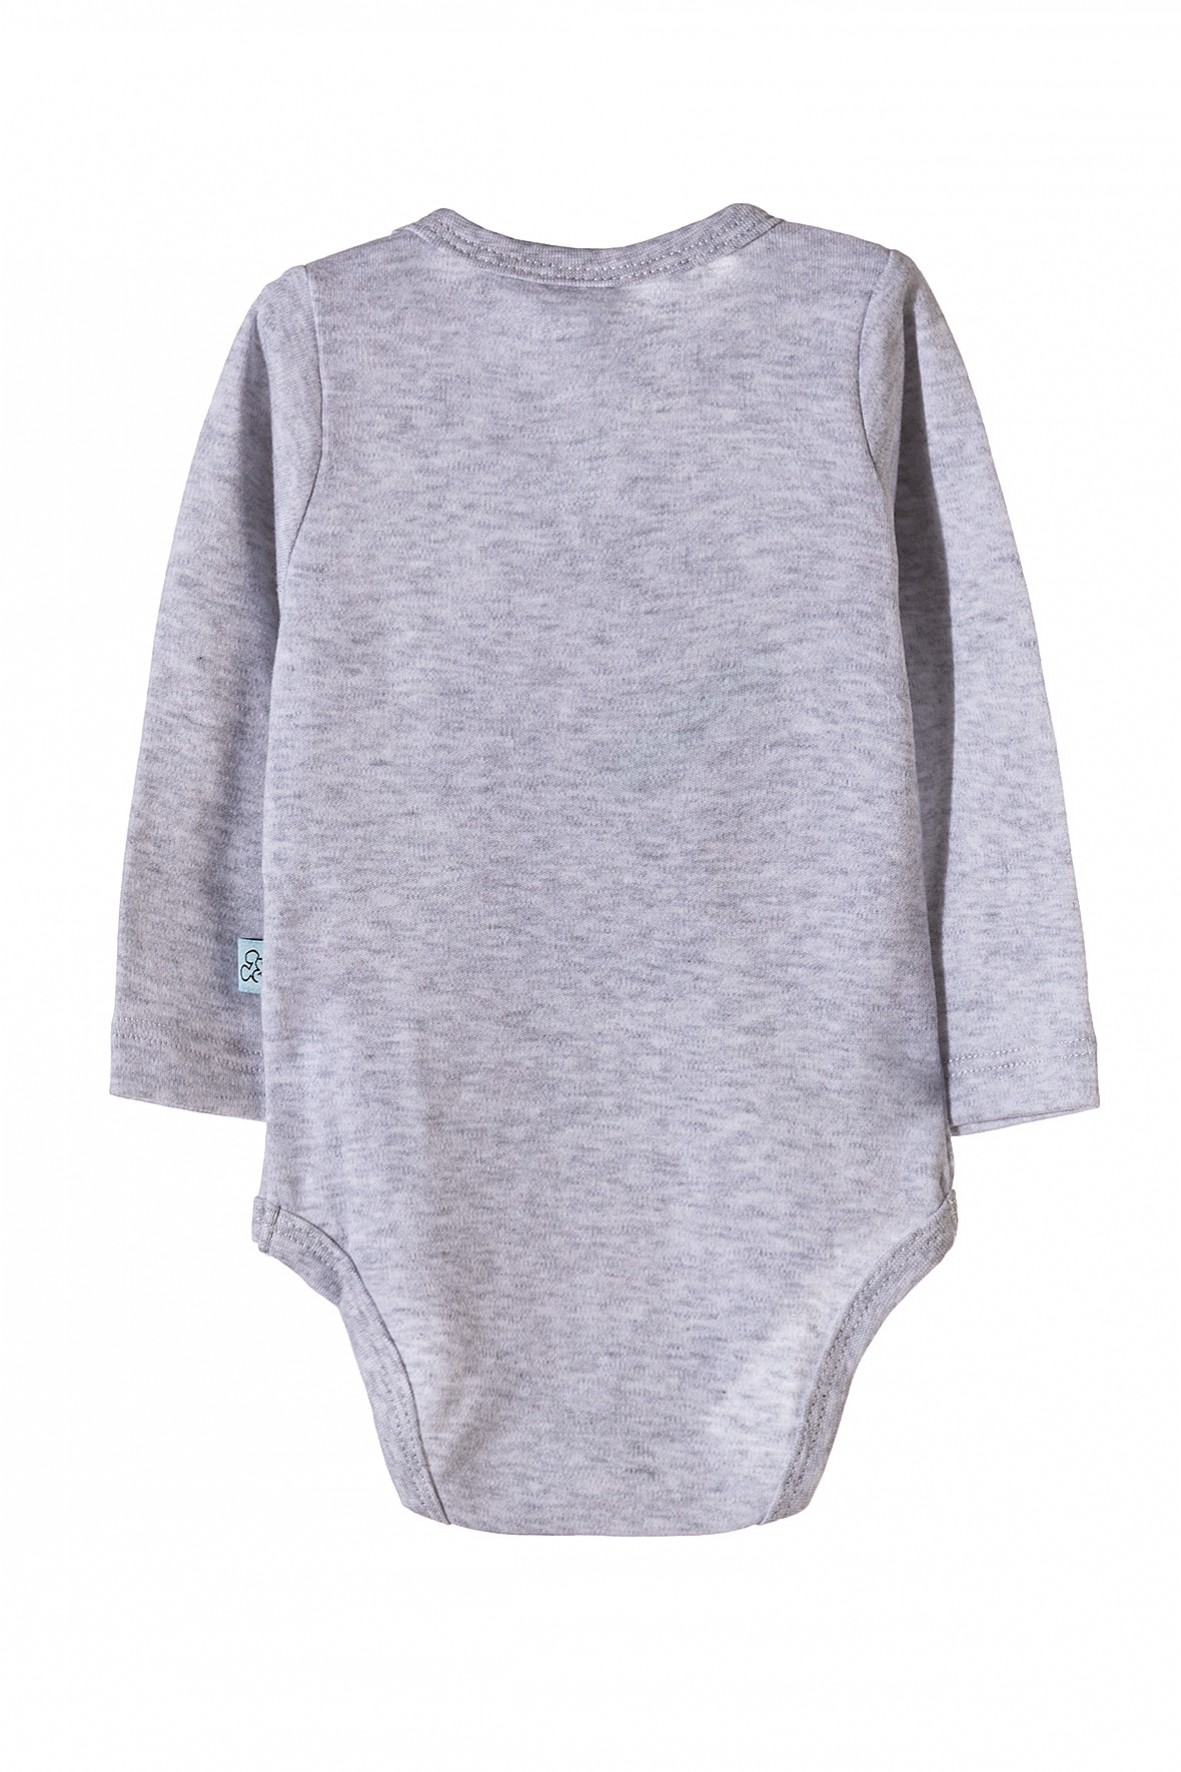 Super Body dla niemowlaka Mickey 5T35B8   Sklep 5.10.15 UV96